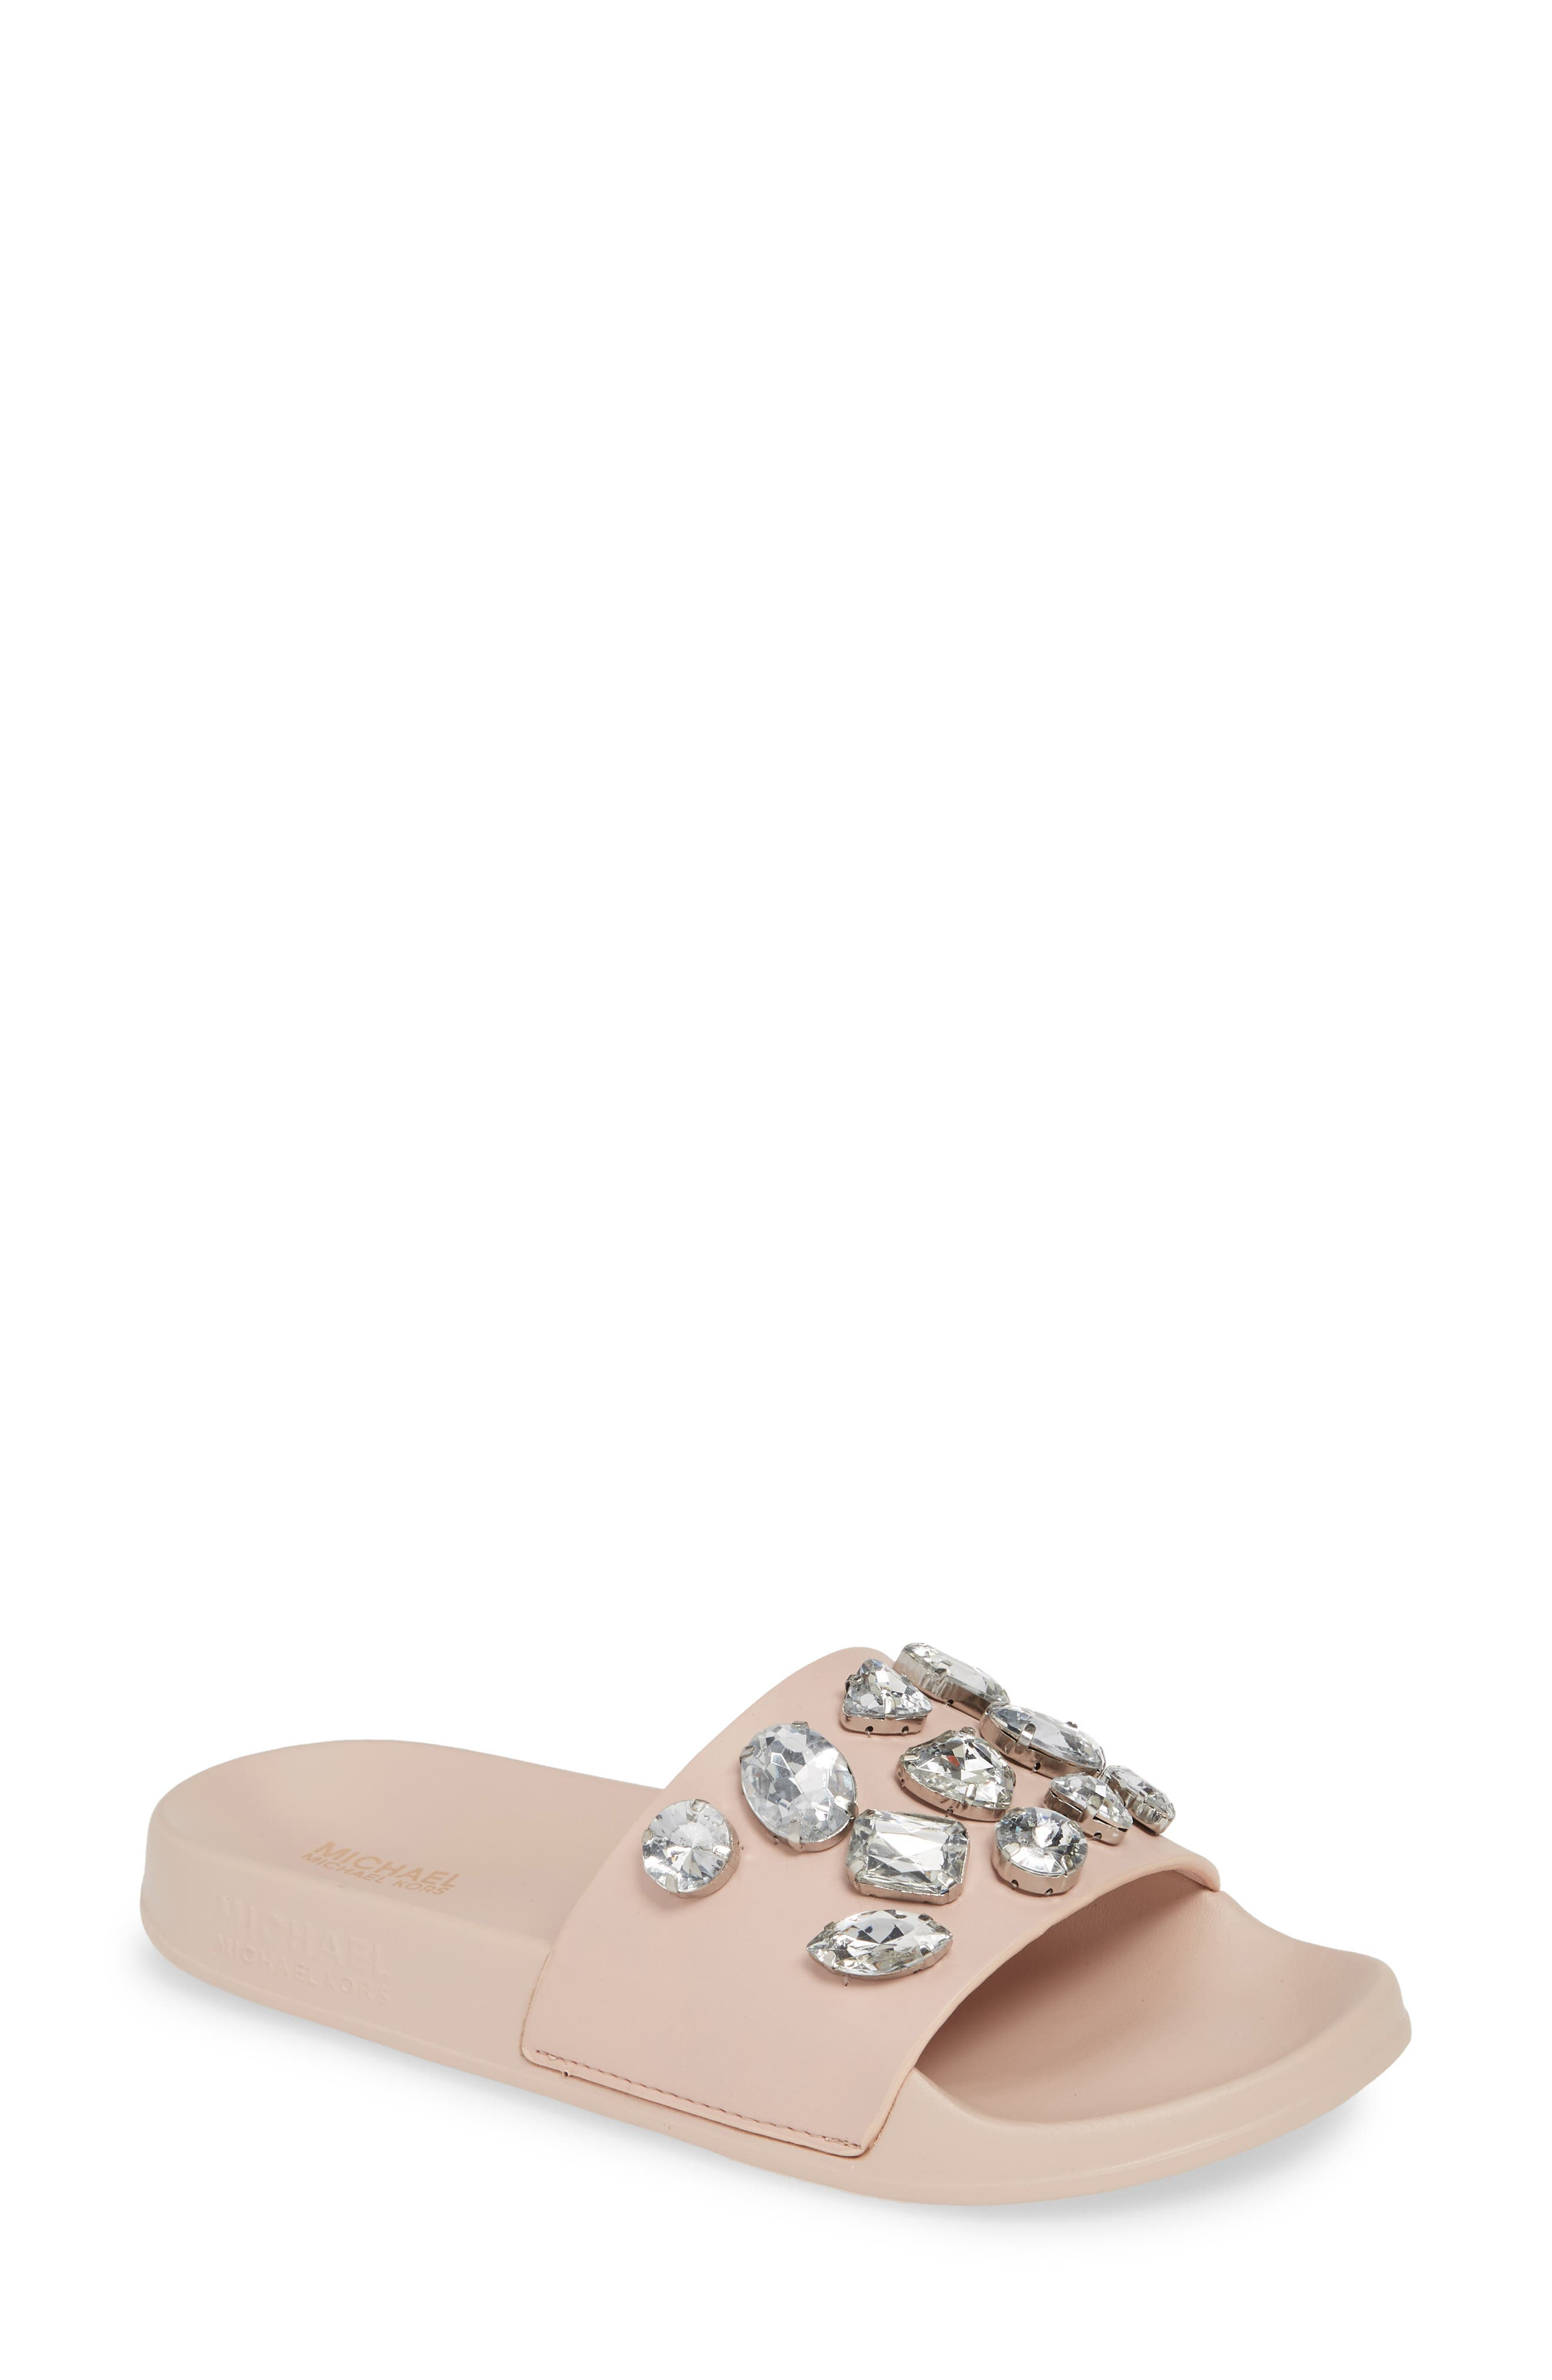 Michael Michael Kors Gilmore Slide Sandal, Pink